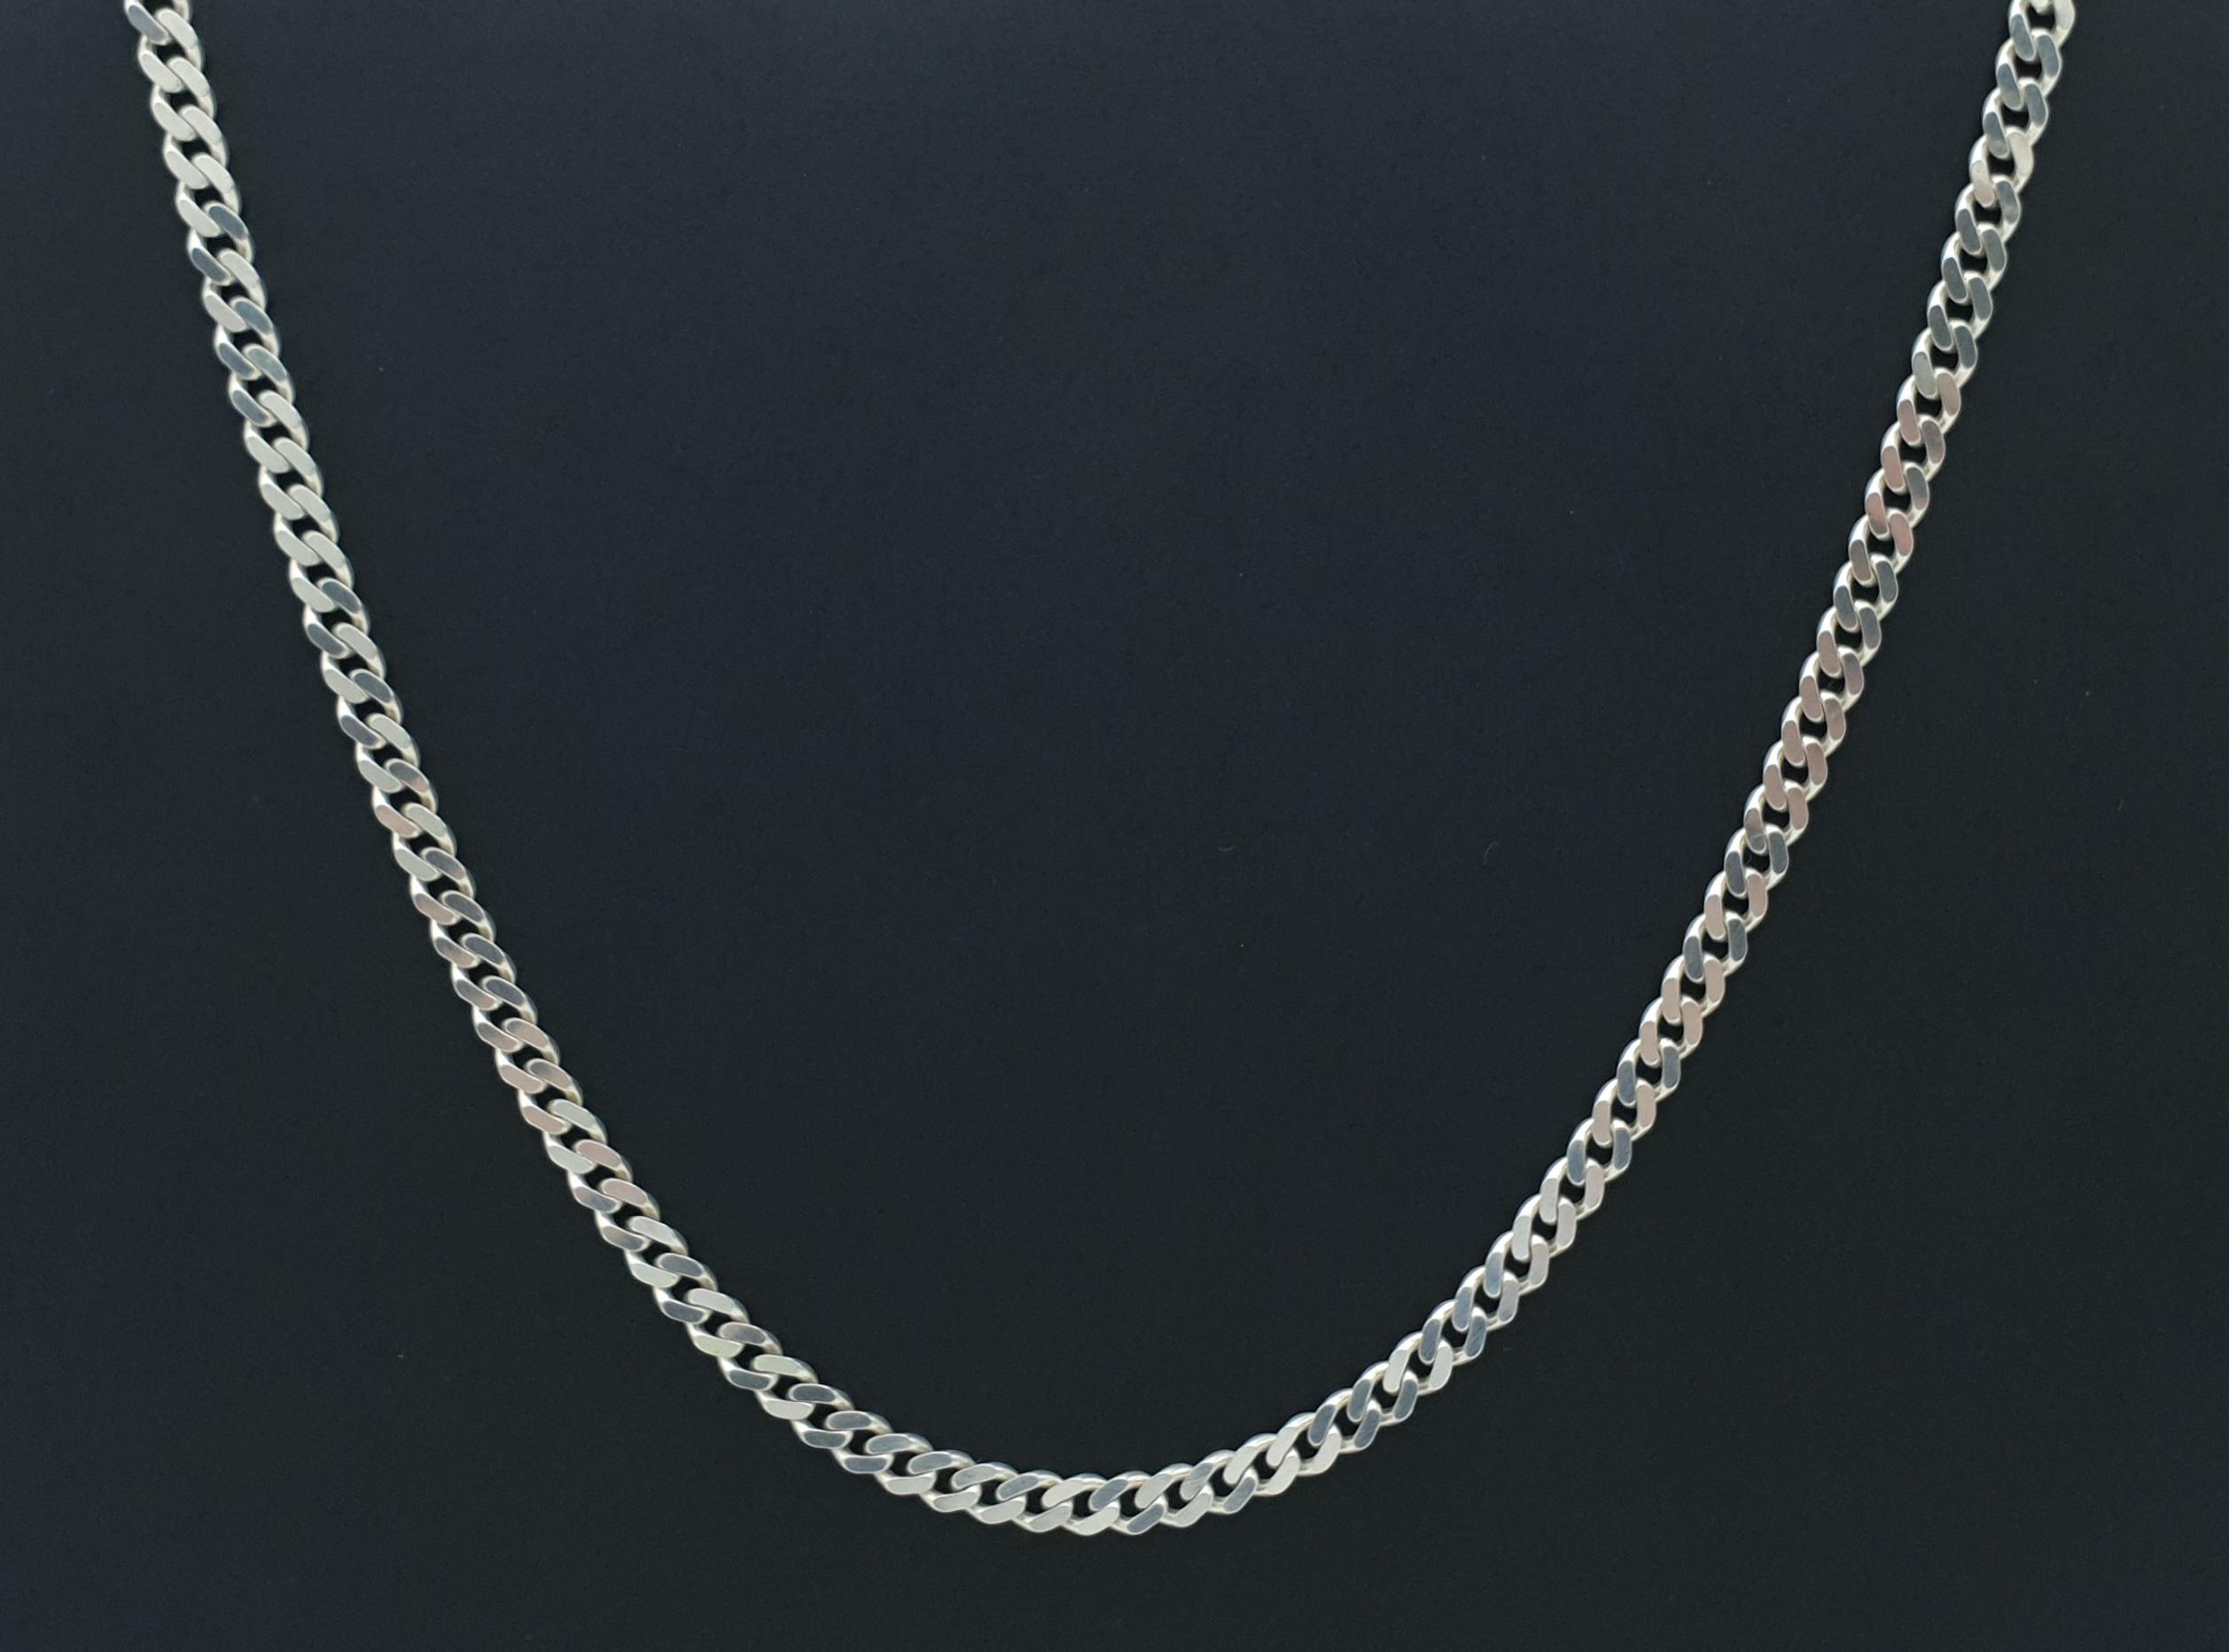 ketting 50 cm zilver unisex 925 zilver ketting 25 gram zilveren ketting zilve rketting 925 italy 925 gemerkt zilver